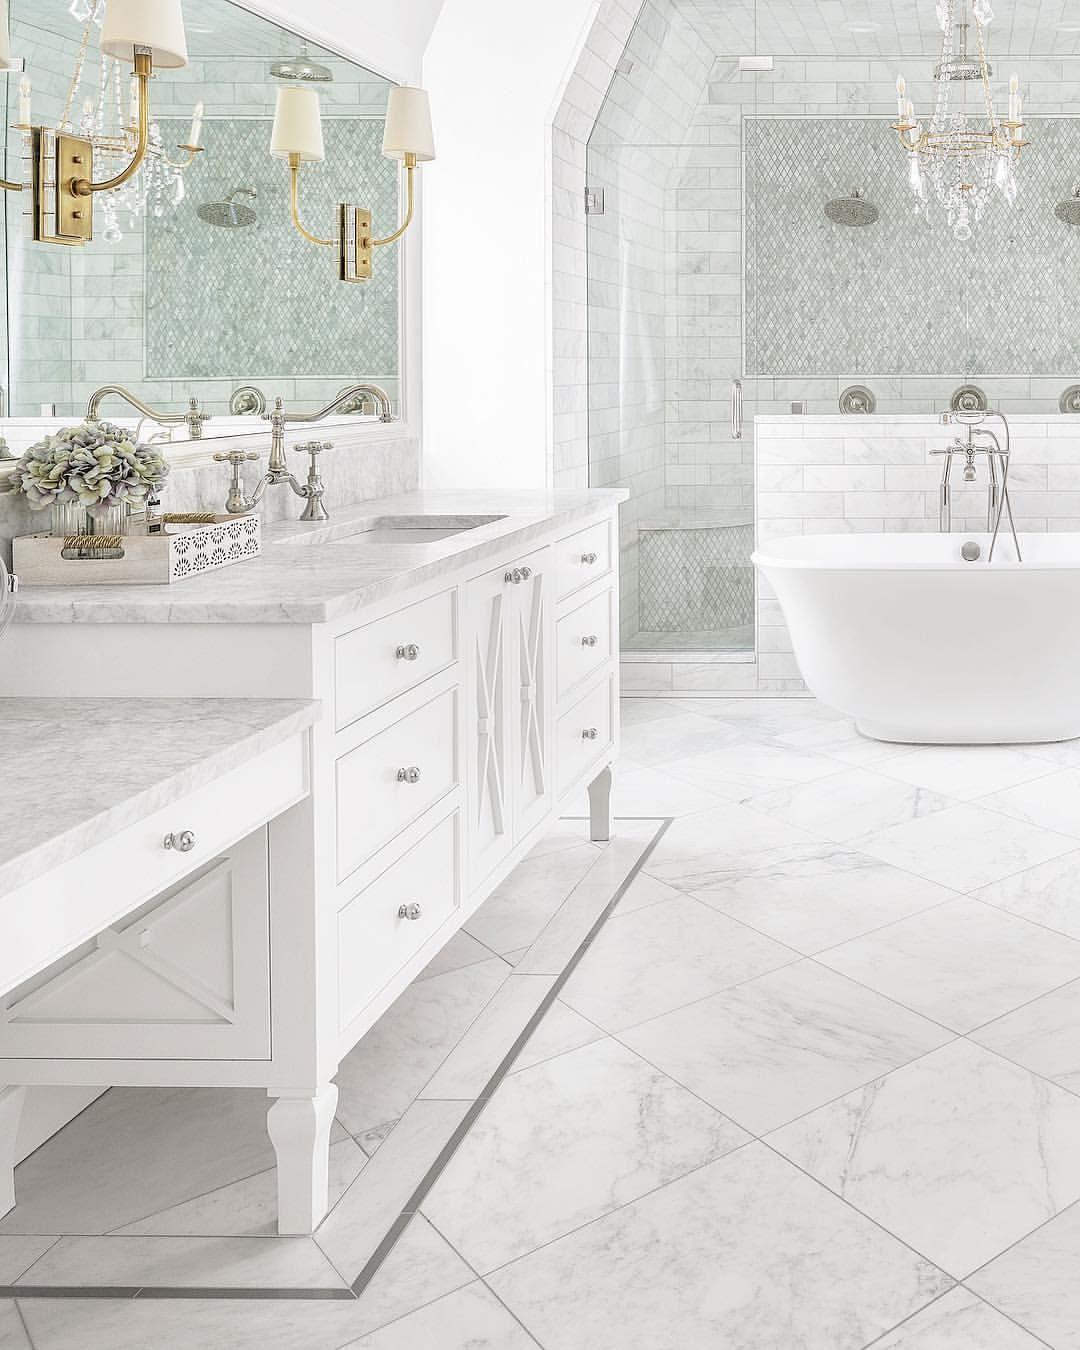 Modernes Landhausstil Badezimmer